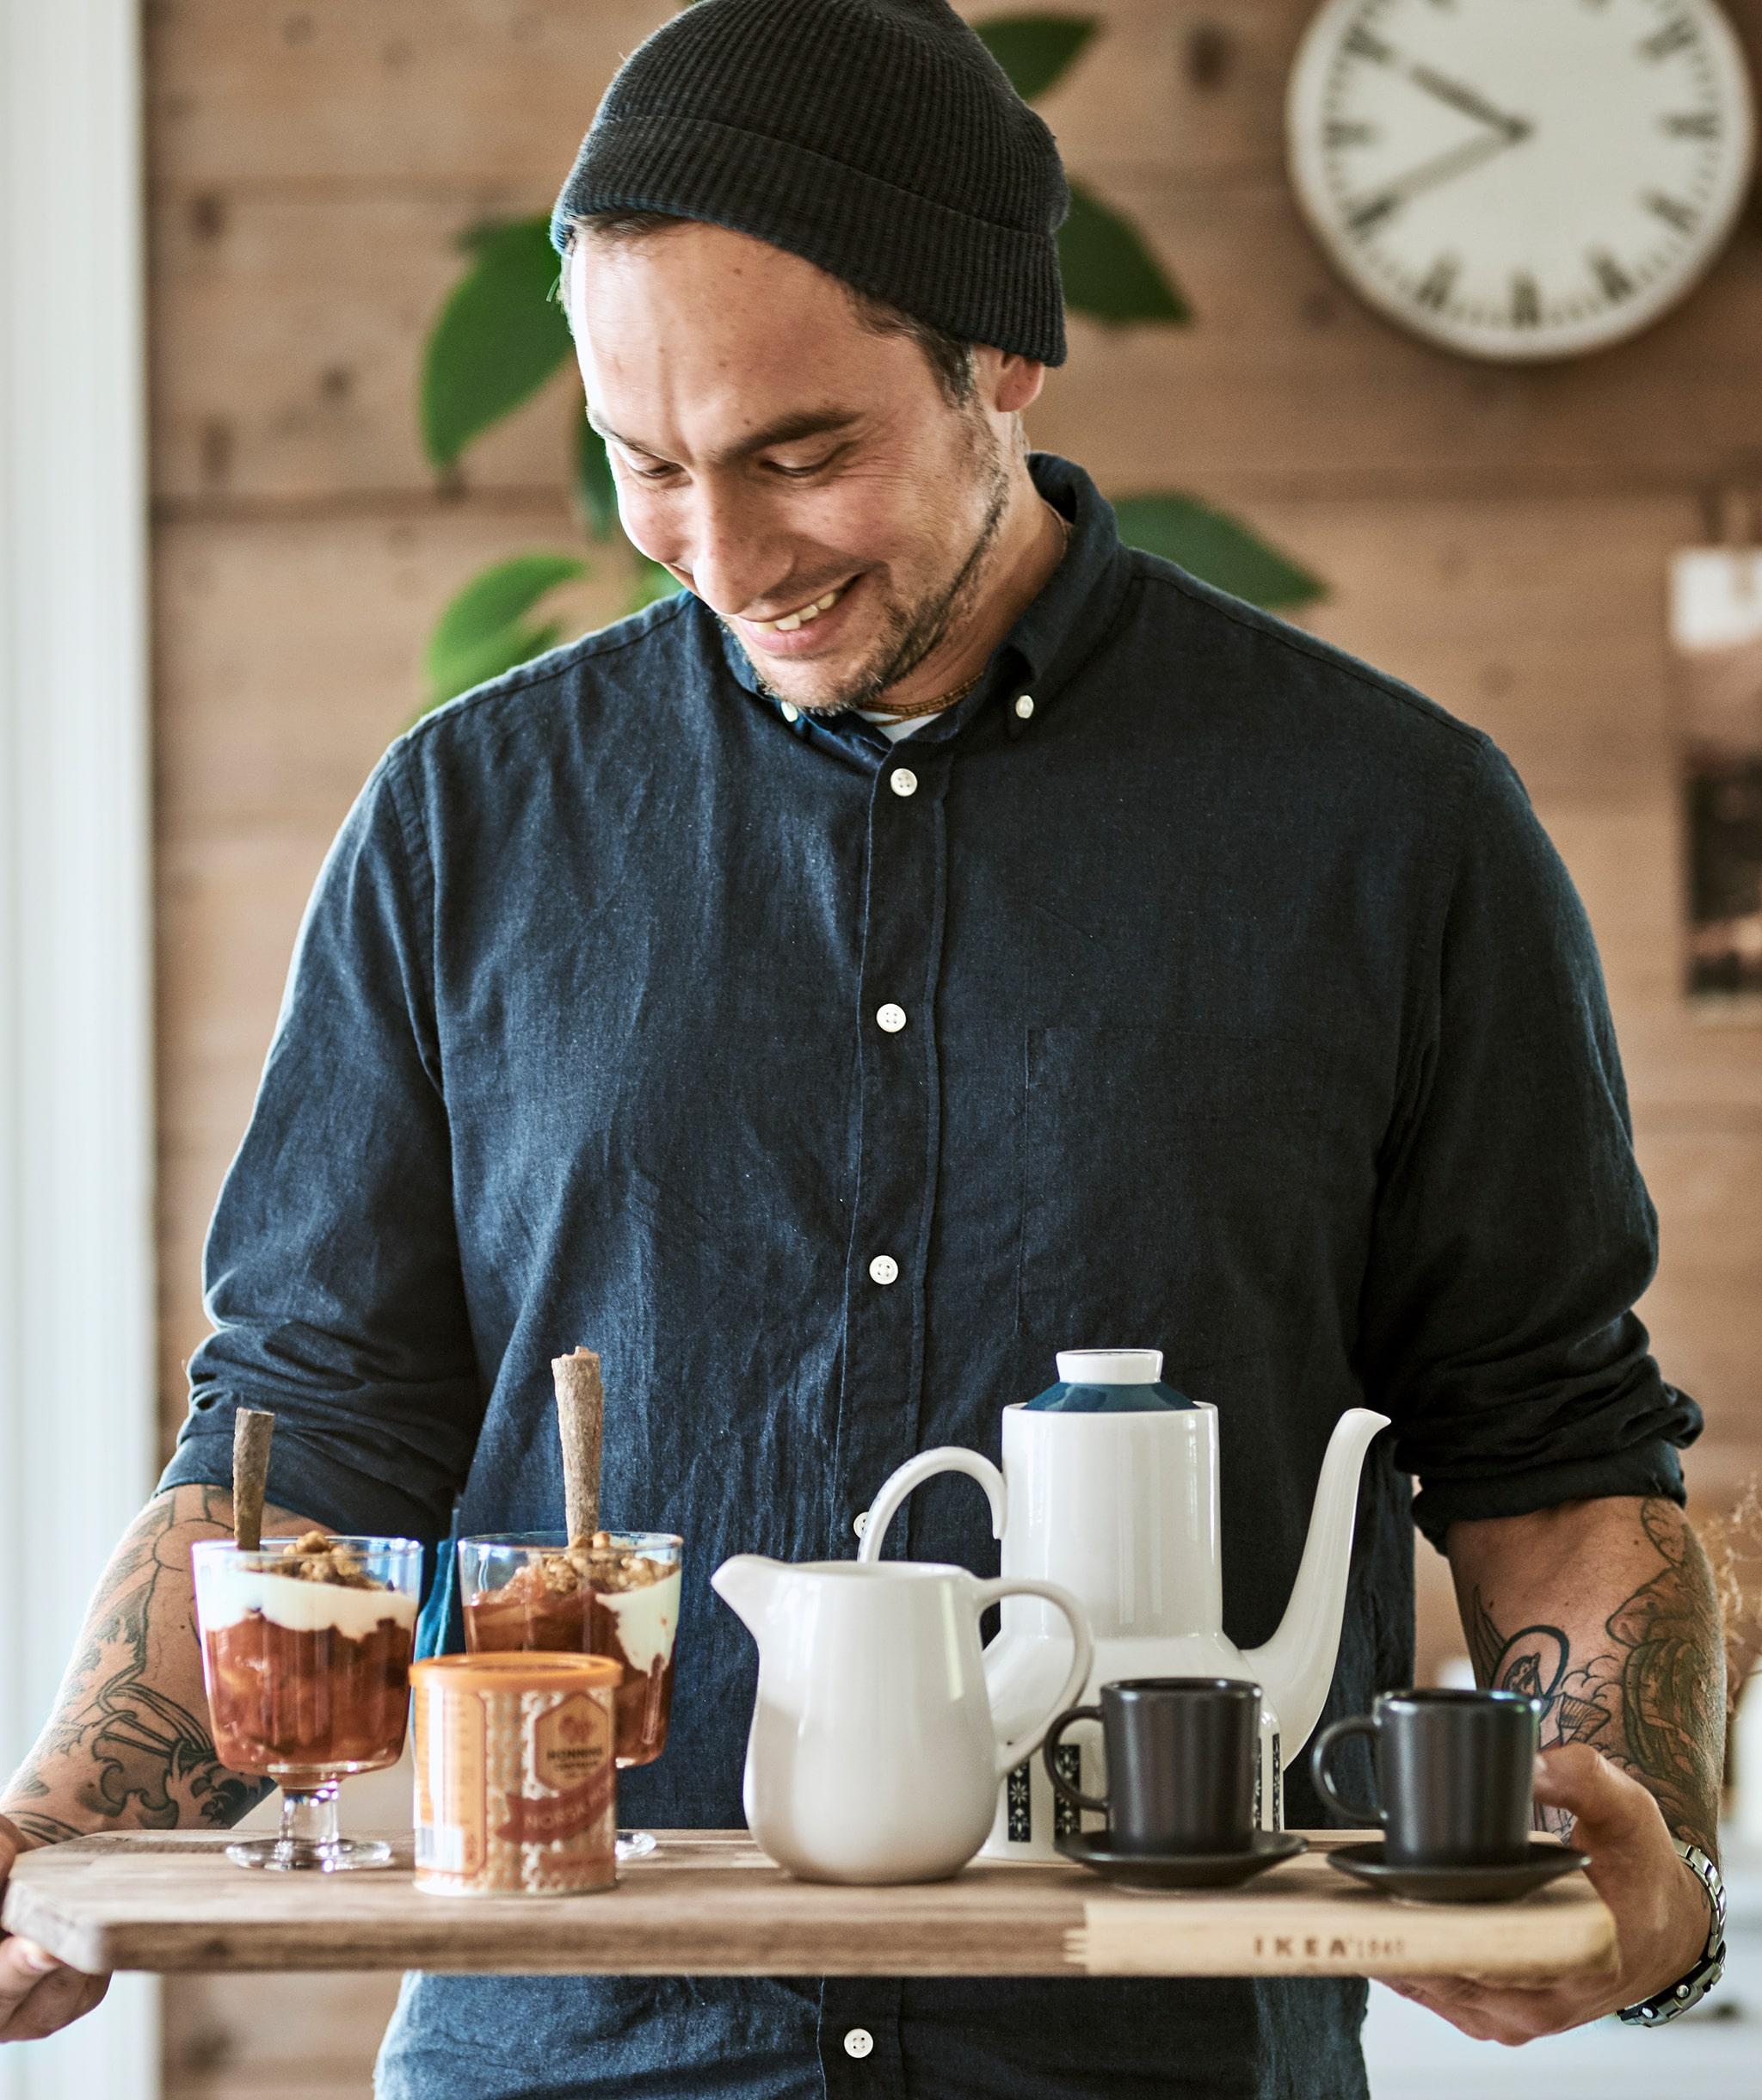 Seorang lelaki bertopi wol menggunakan talenan sebagai nampan untuk membawa teko kopi, cangkir espresso, dan granola dalam gelas.